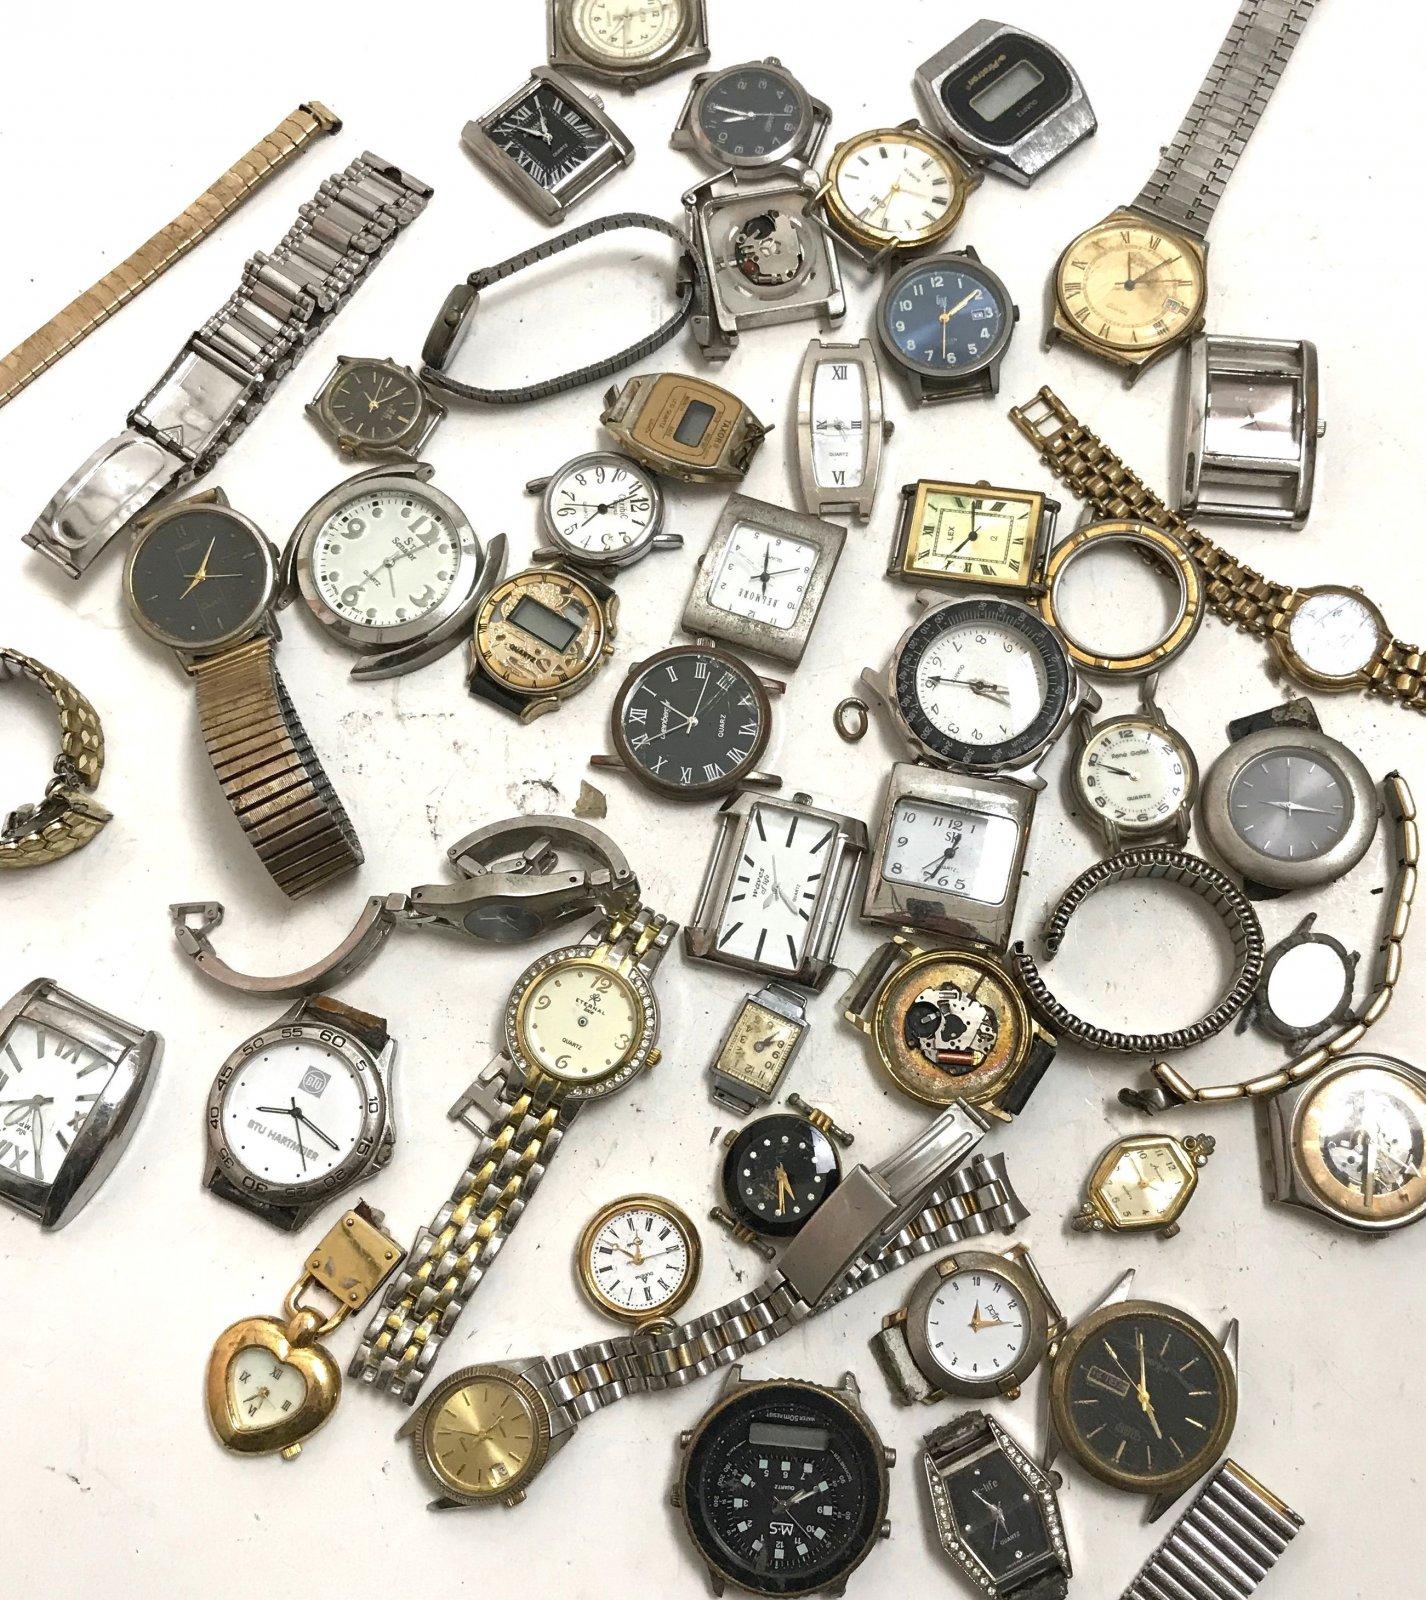 konvolut armbanduhren ersatzteile uhrmacher bastler schrott antik 1 kg 40 st ck ebay. Black Bedroom Furniture Sets. Home Design Ideas